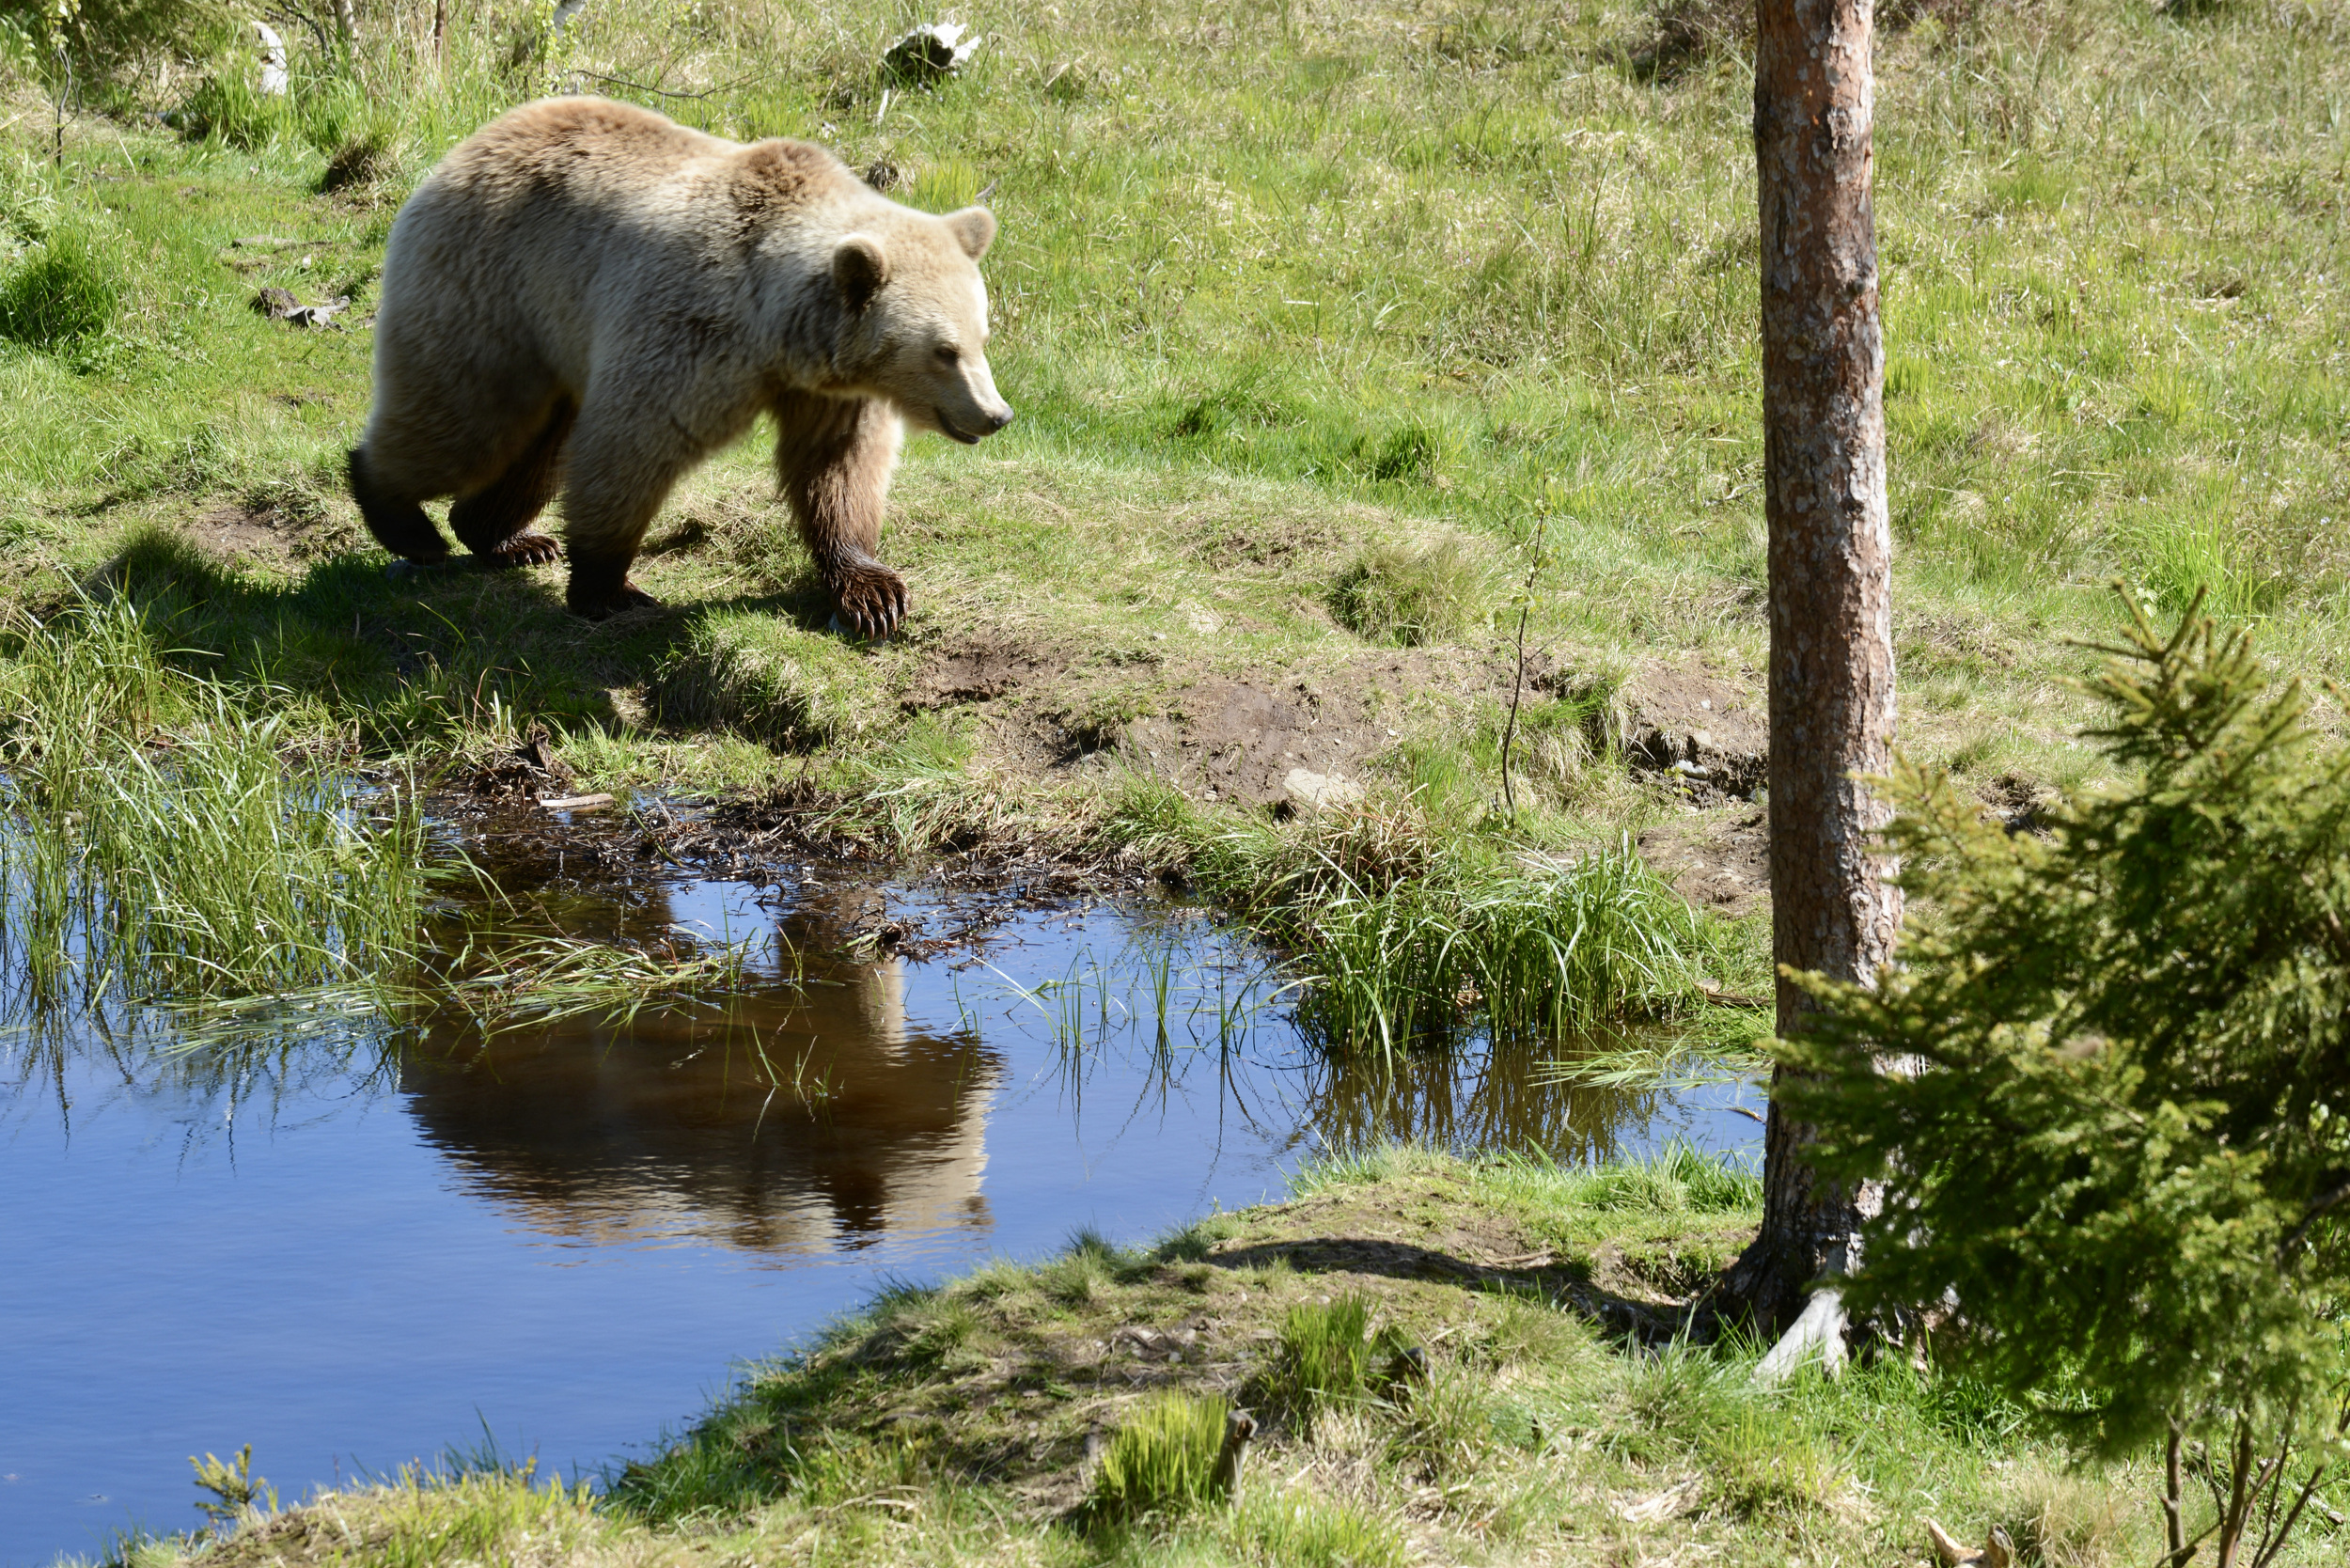 Animals, brown bear, fauna, nature, Norway, summer, water, watering hole, tree, reflection, , Povarova Ree Svetlana